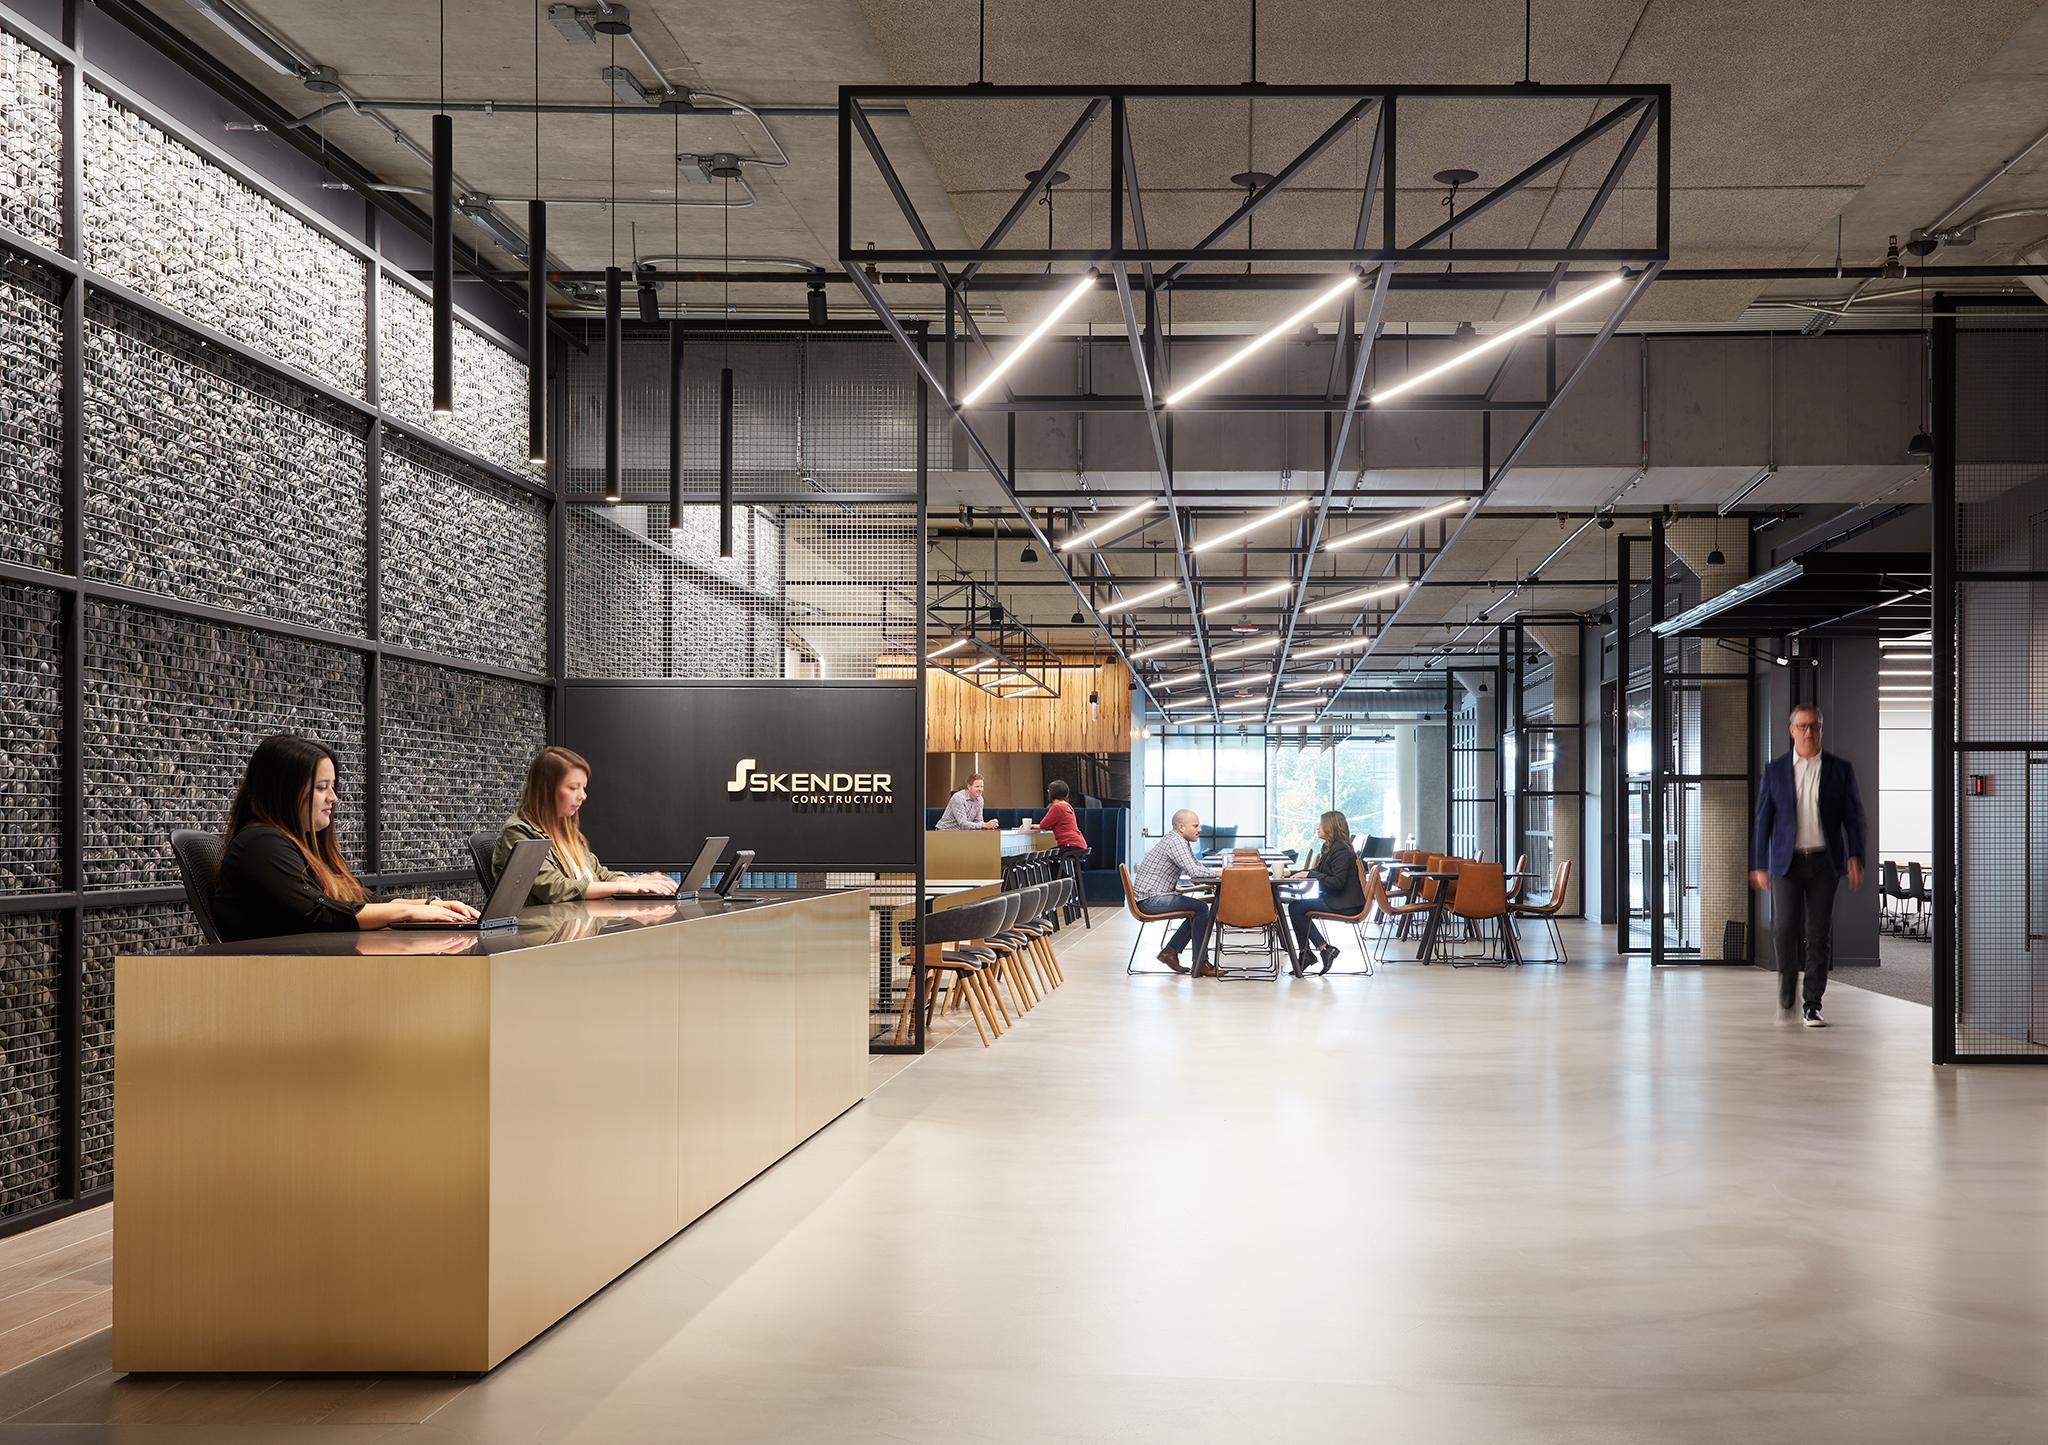 A Tour of Skender's Elegant Chicago Office